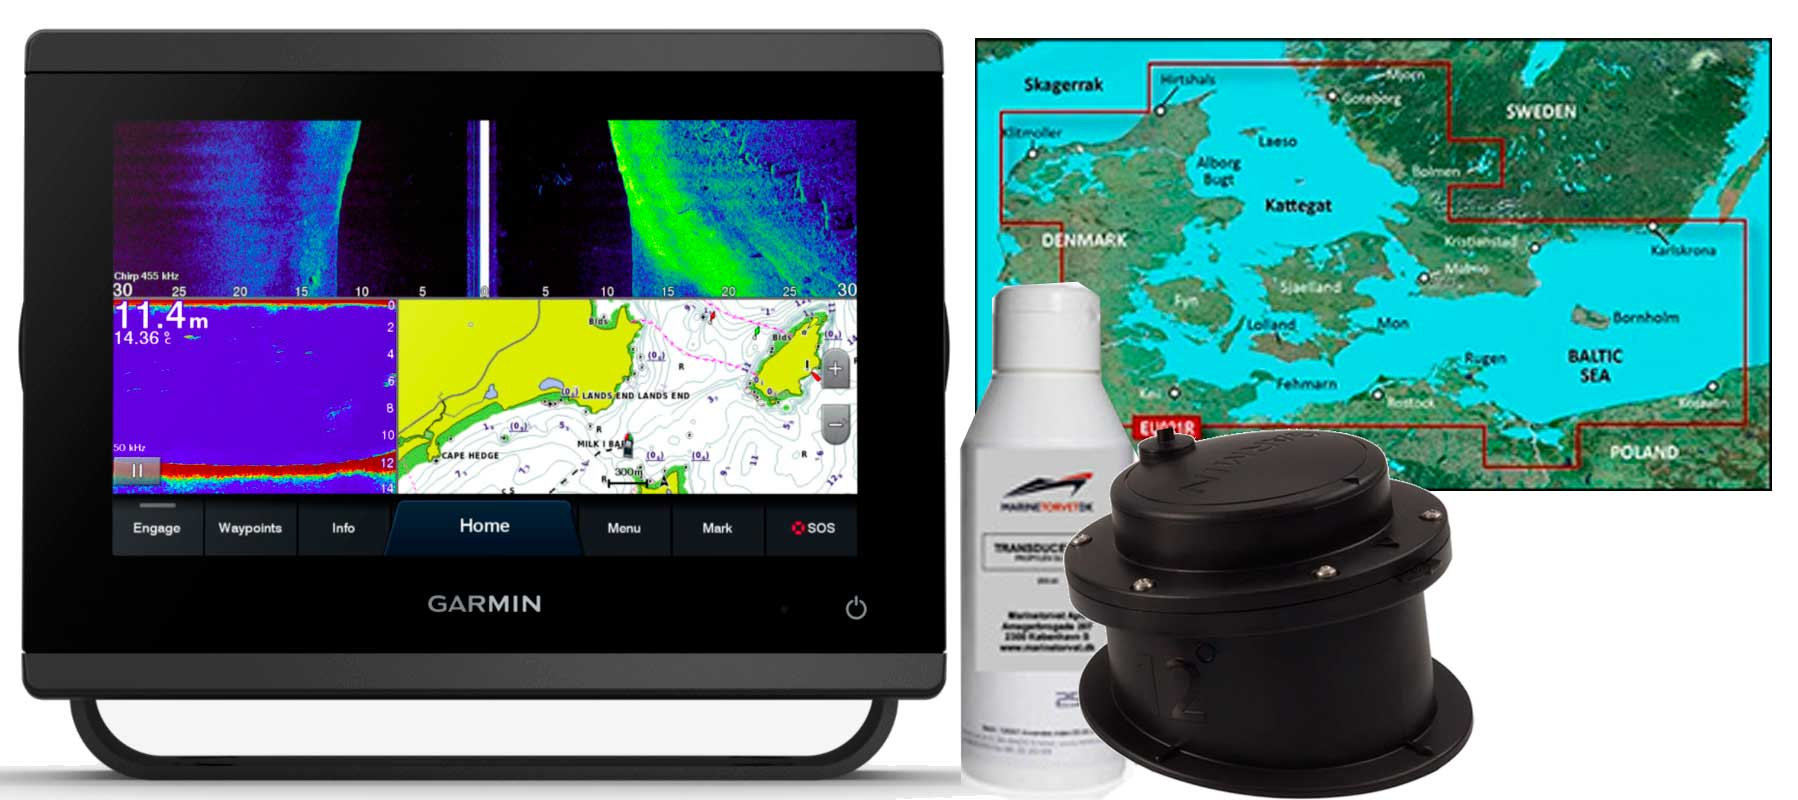 Garmin GPSmap 723xsv, GT15M-IH og HXEU021R